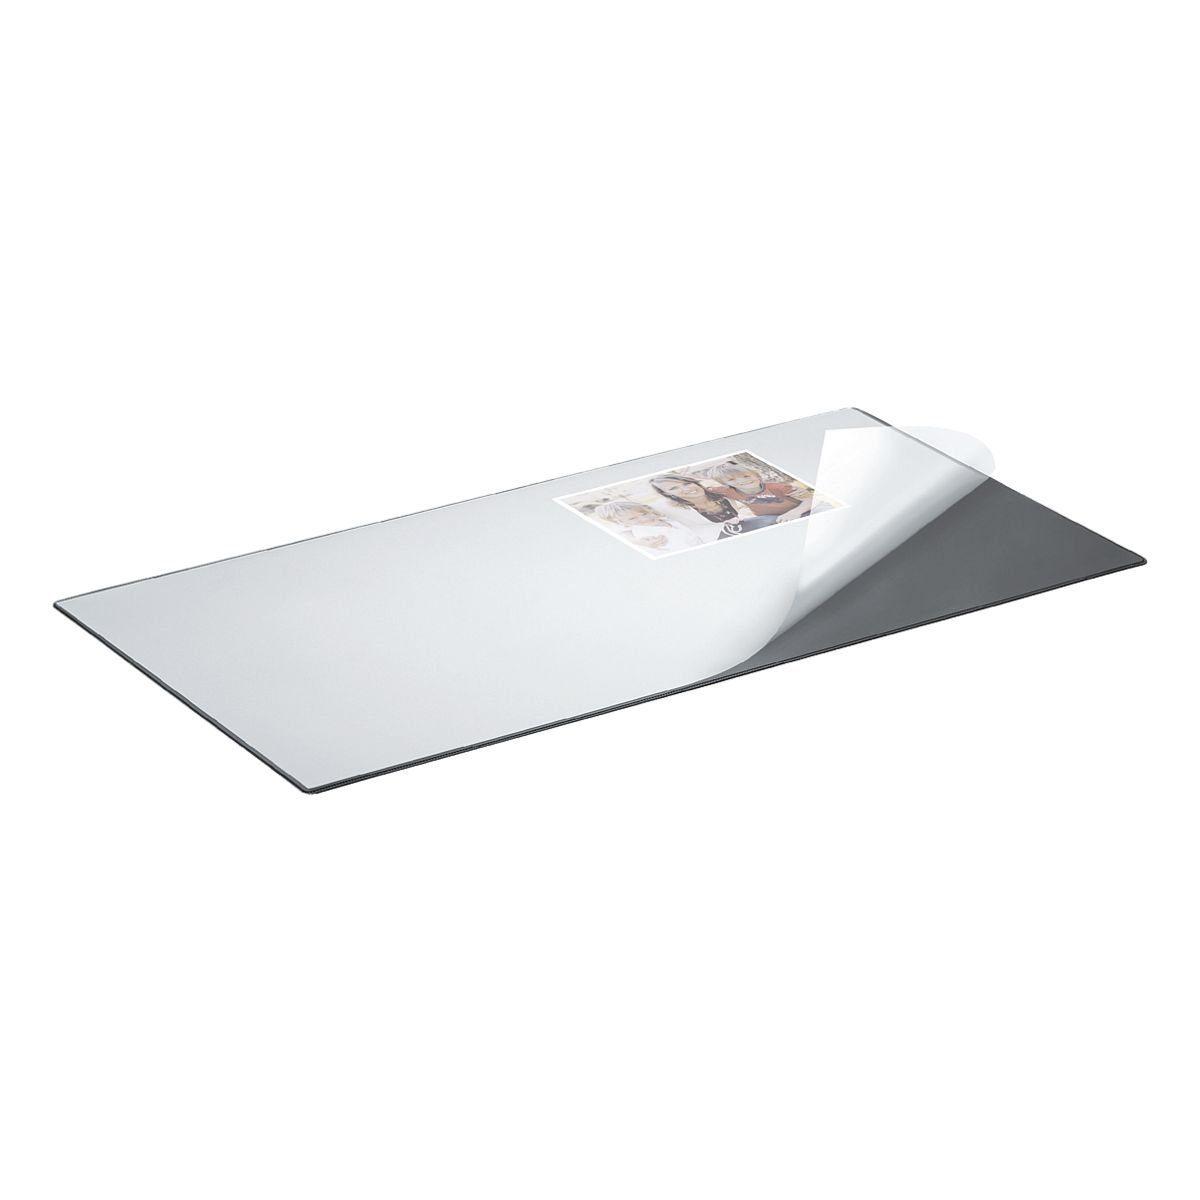 Hansa Schreibunterlage H6004003 »Computer Pad Cover«